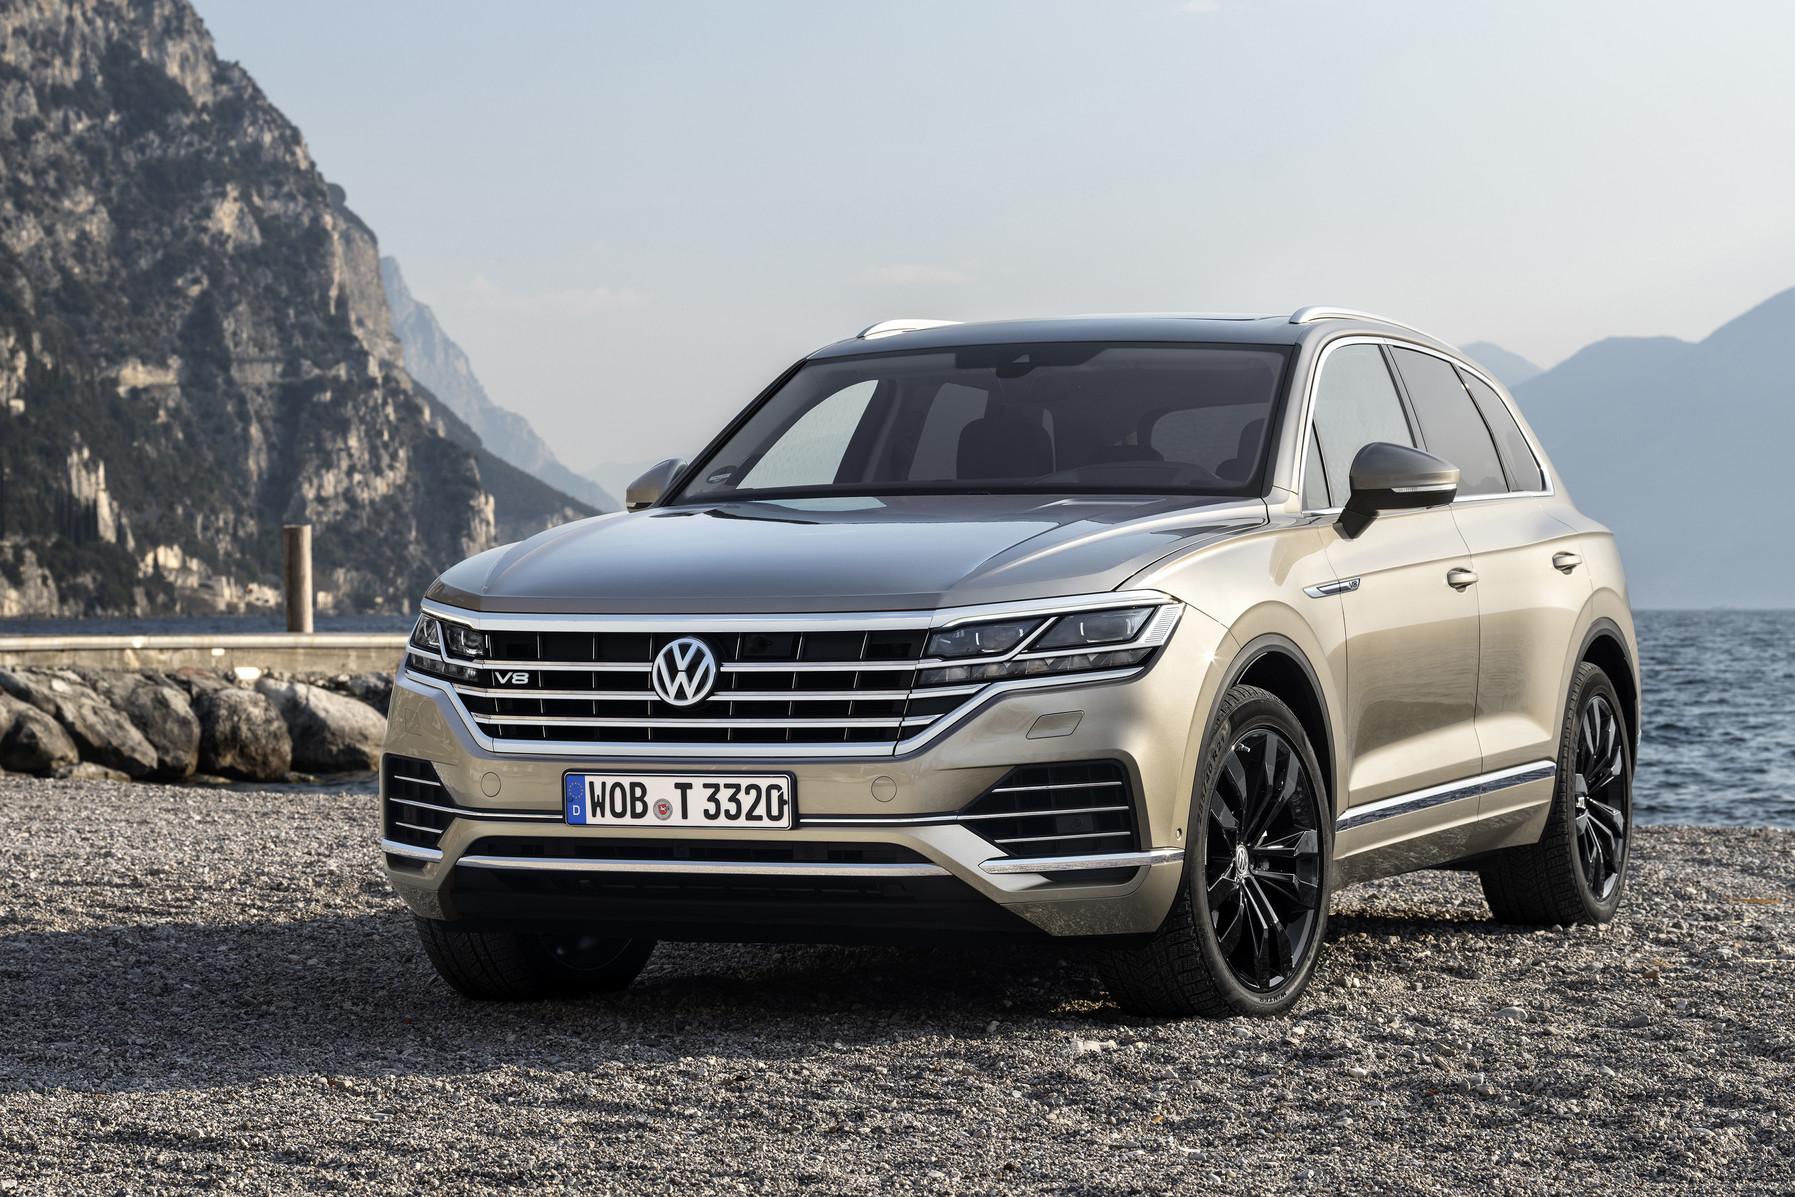 VW Touareg For Sale >> Volkswagen Touareg V8 TDI Gets Diesel V8 from Bentley Bentayga - GTspirit